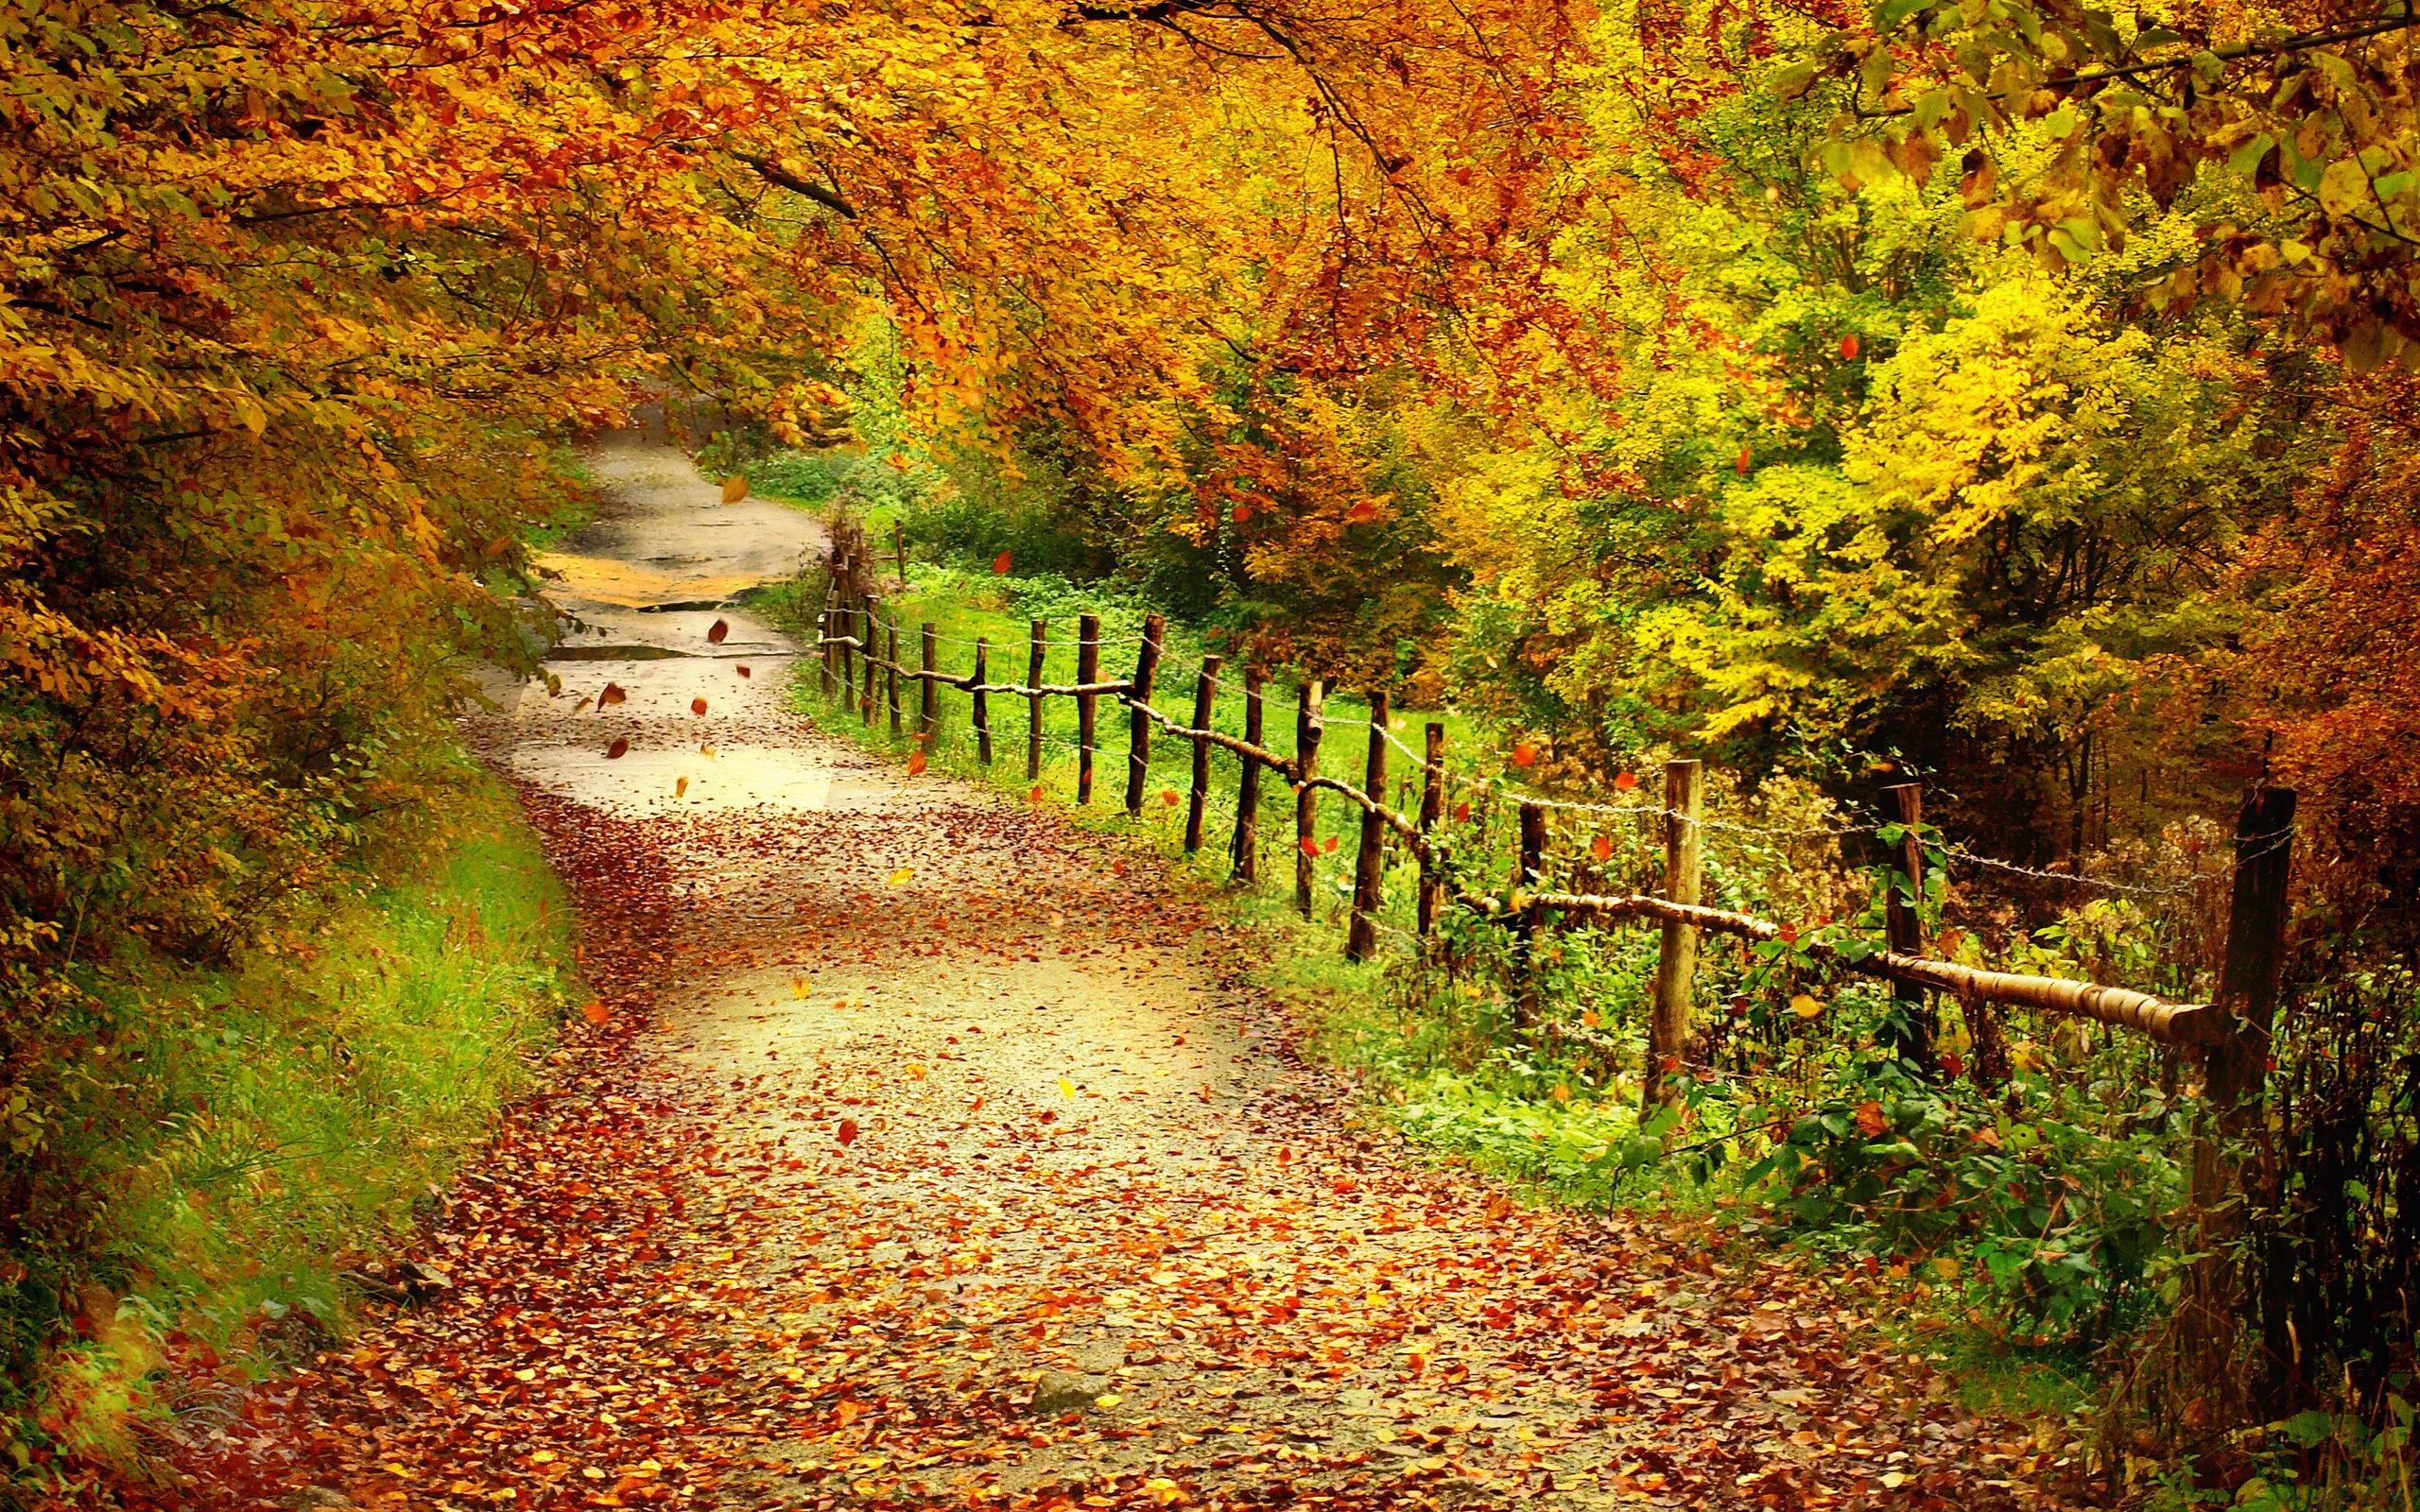 free autumn wallpaper hd 20813 2560x1600 px hdwallsourcecom